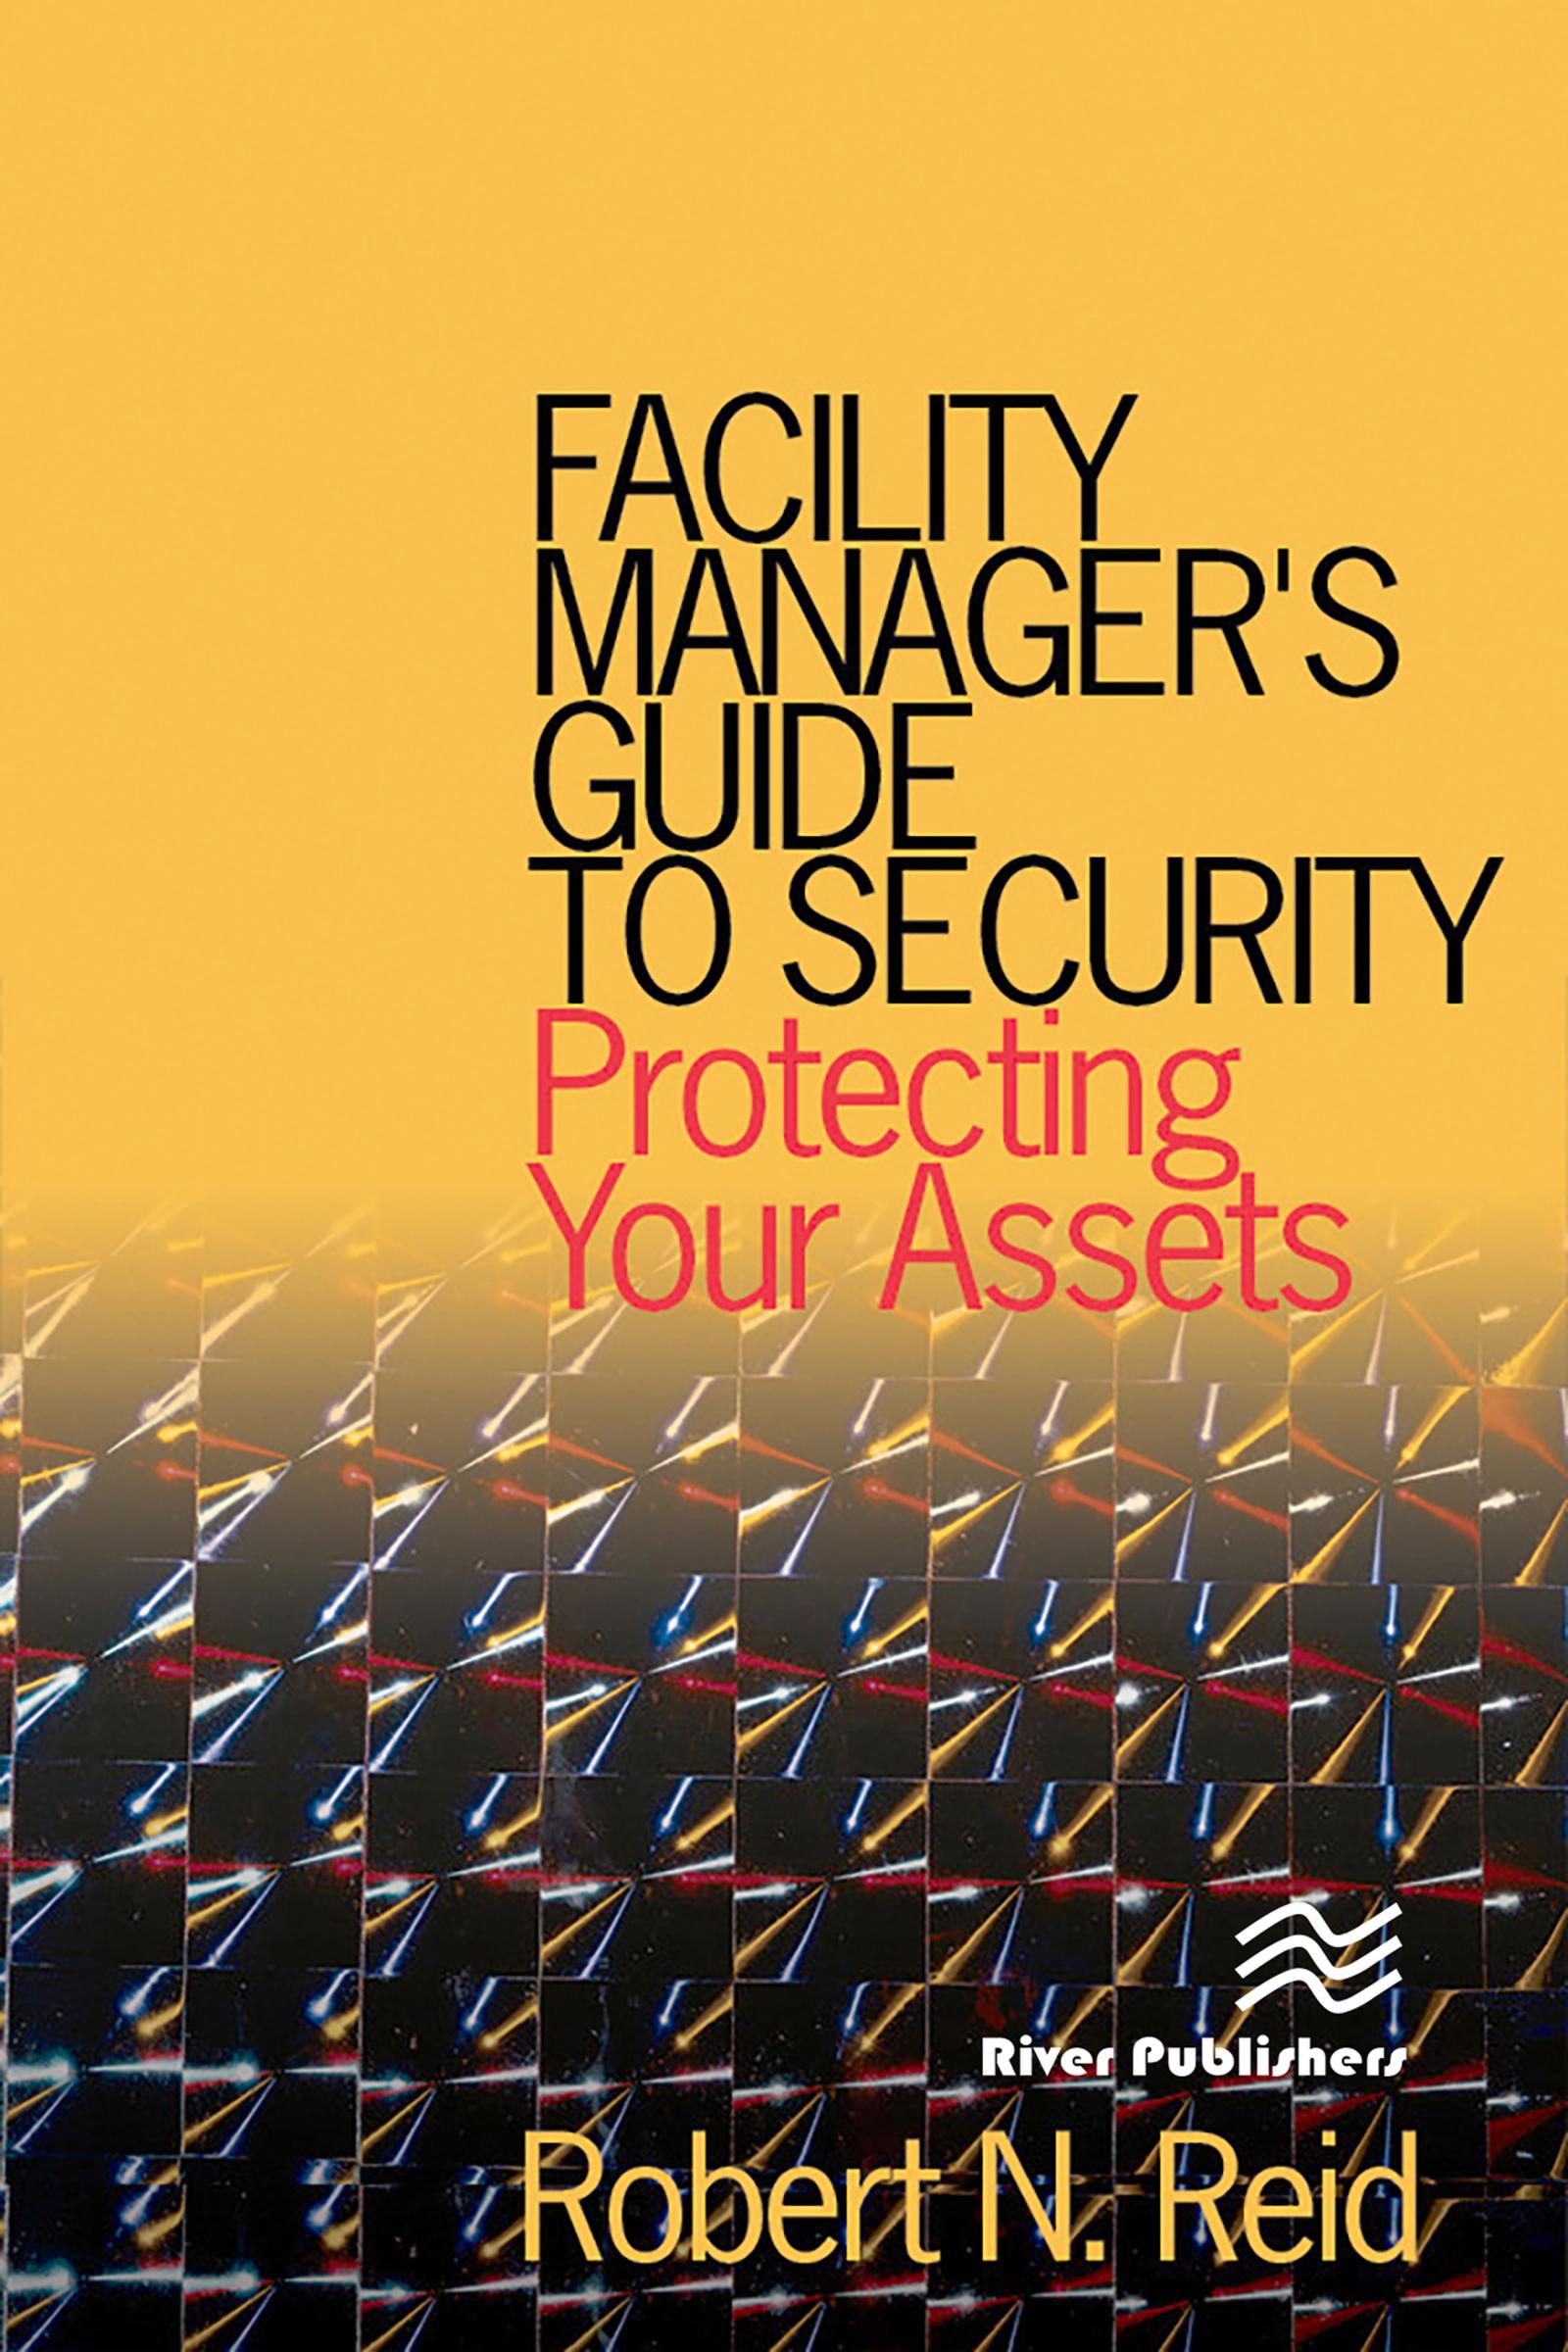 Access Hardware: Mechanical Locks, Latches, Keys